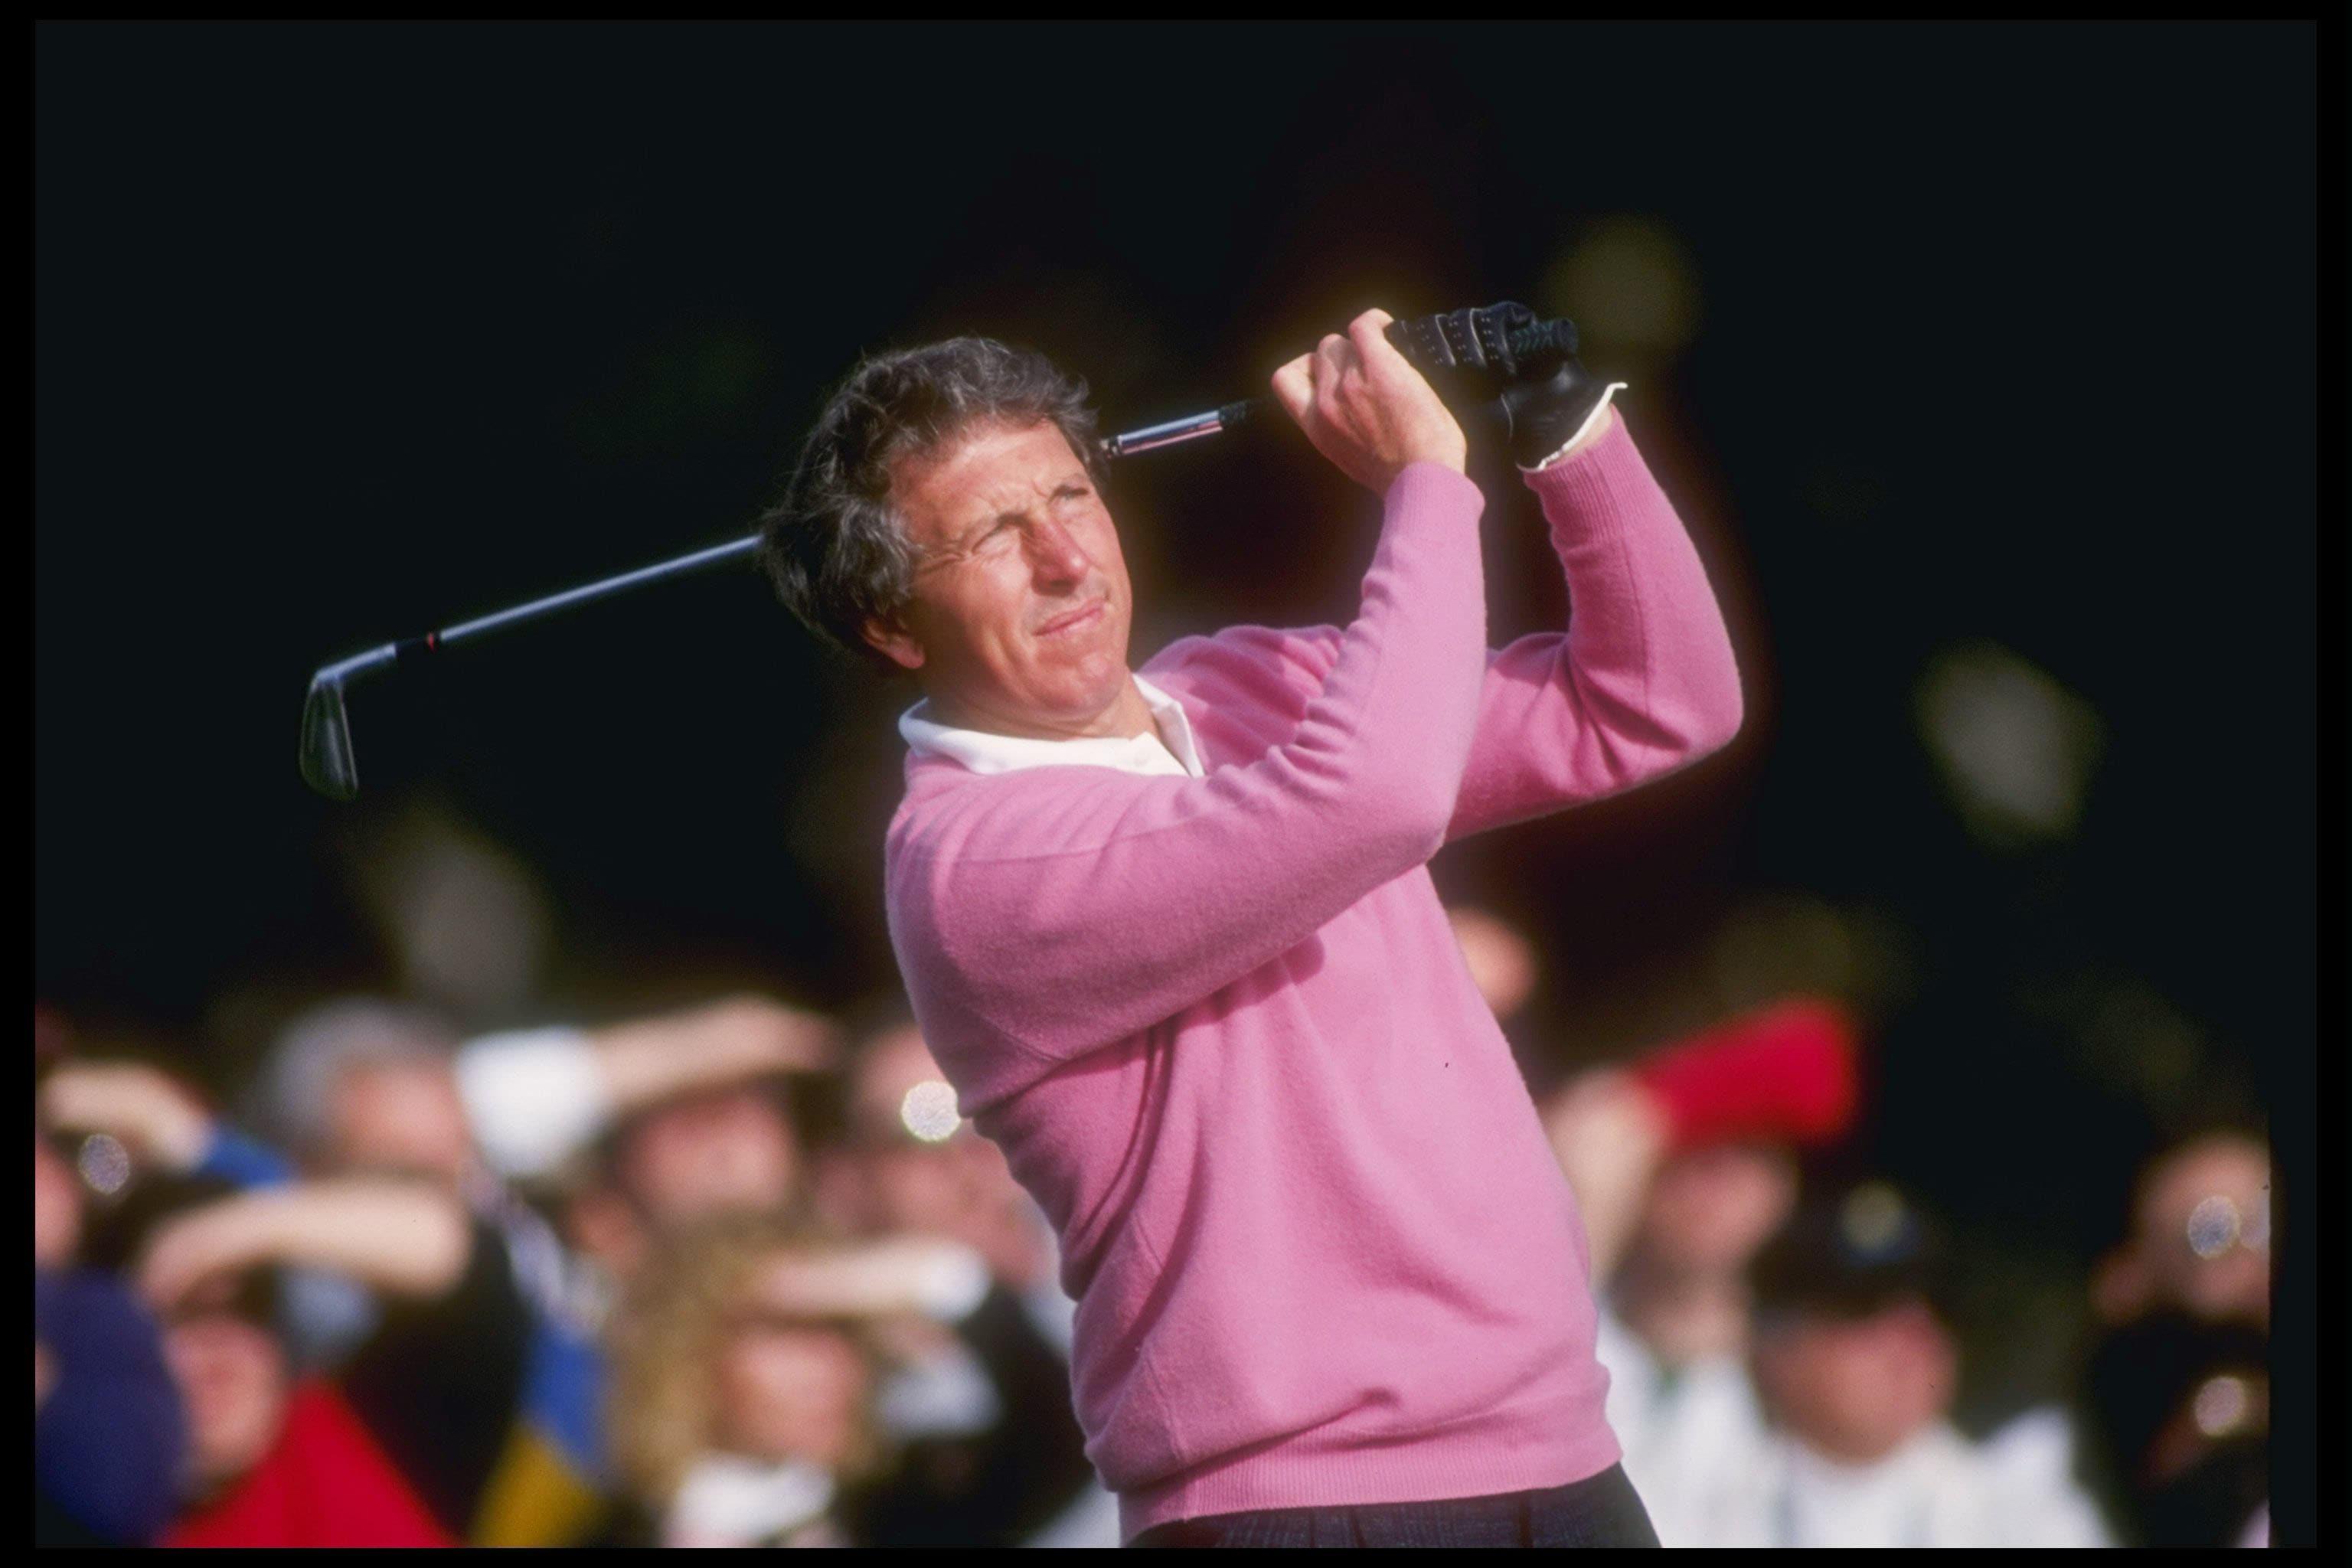 7. 1984: Irwin's rocky ricochet